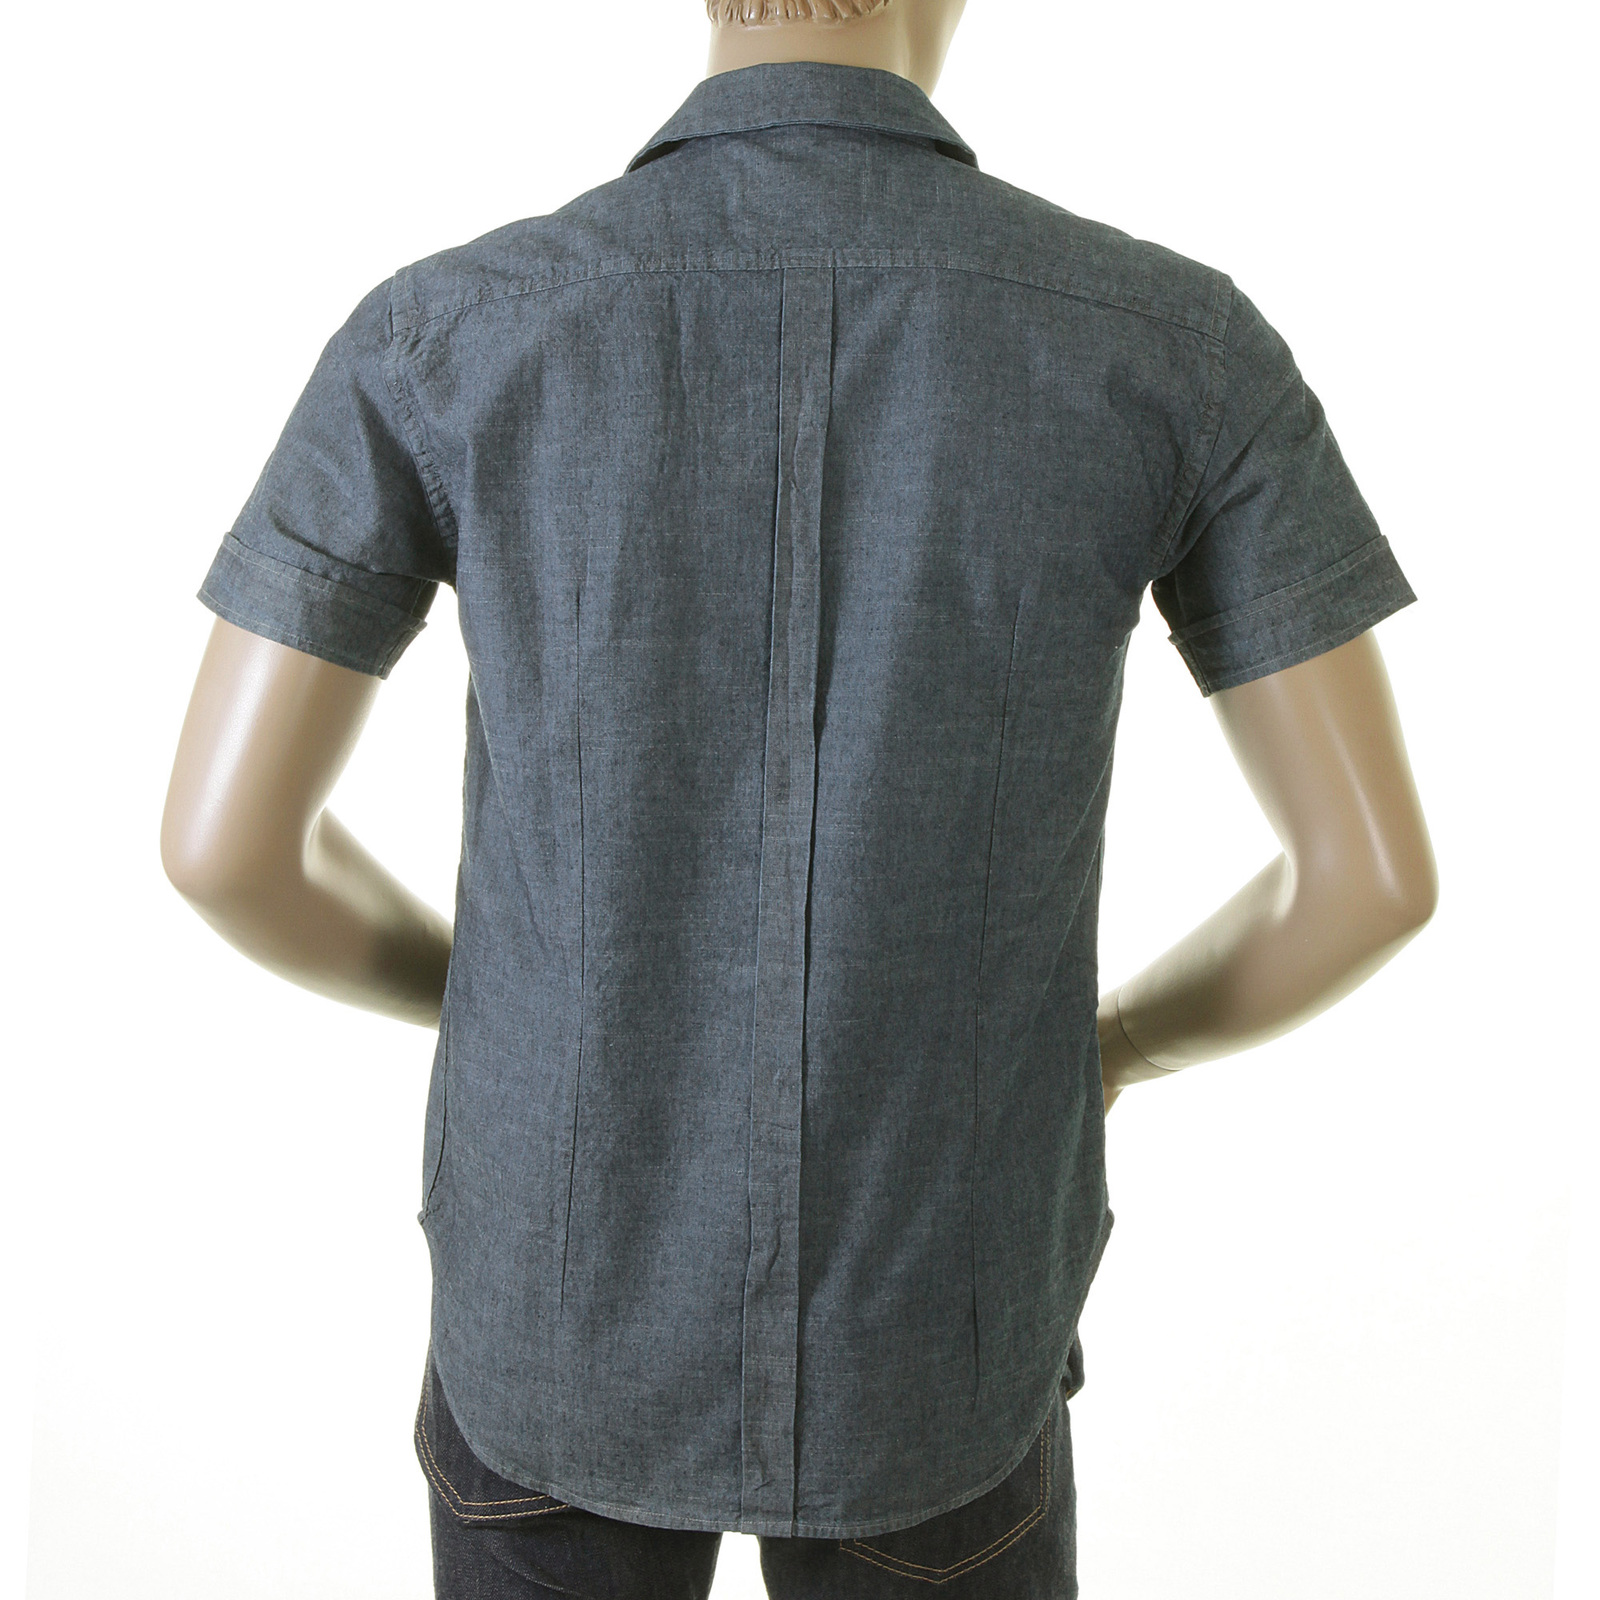 b3c72e7525a Evisu Mens Denim Blue Early Original 1 Pocket Chambray Short Sleeve Regular  Fit Chambray Shirt with Cuban Collar EVIS0137